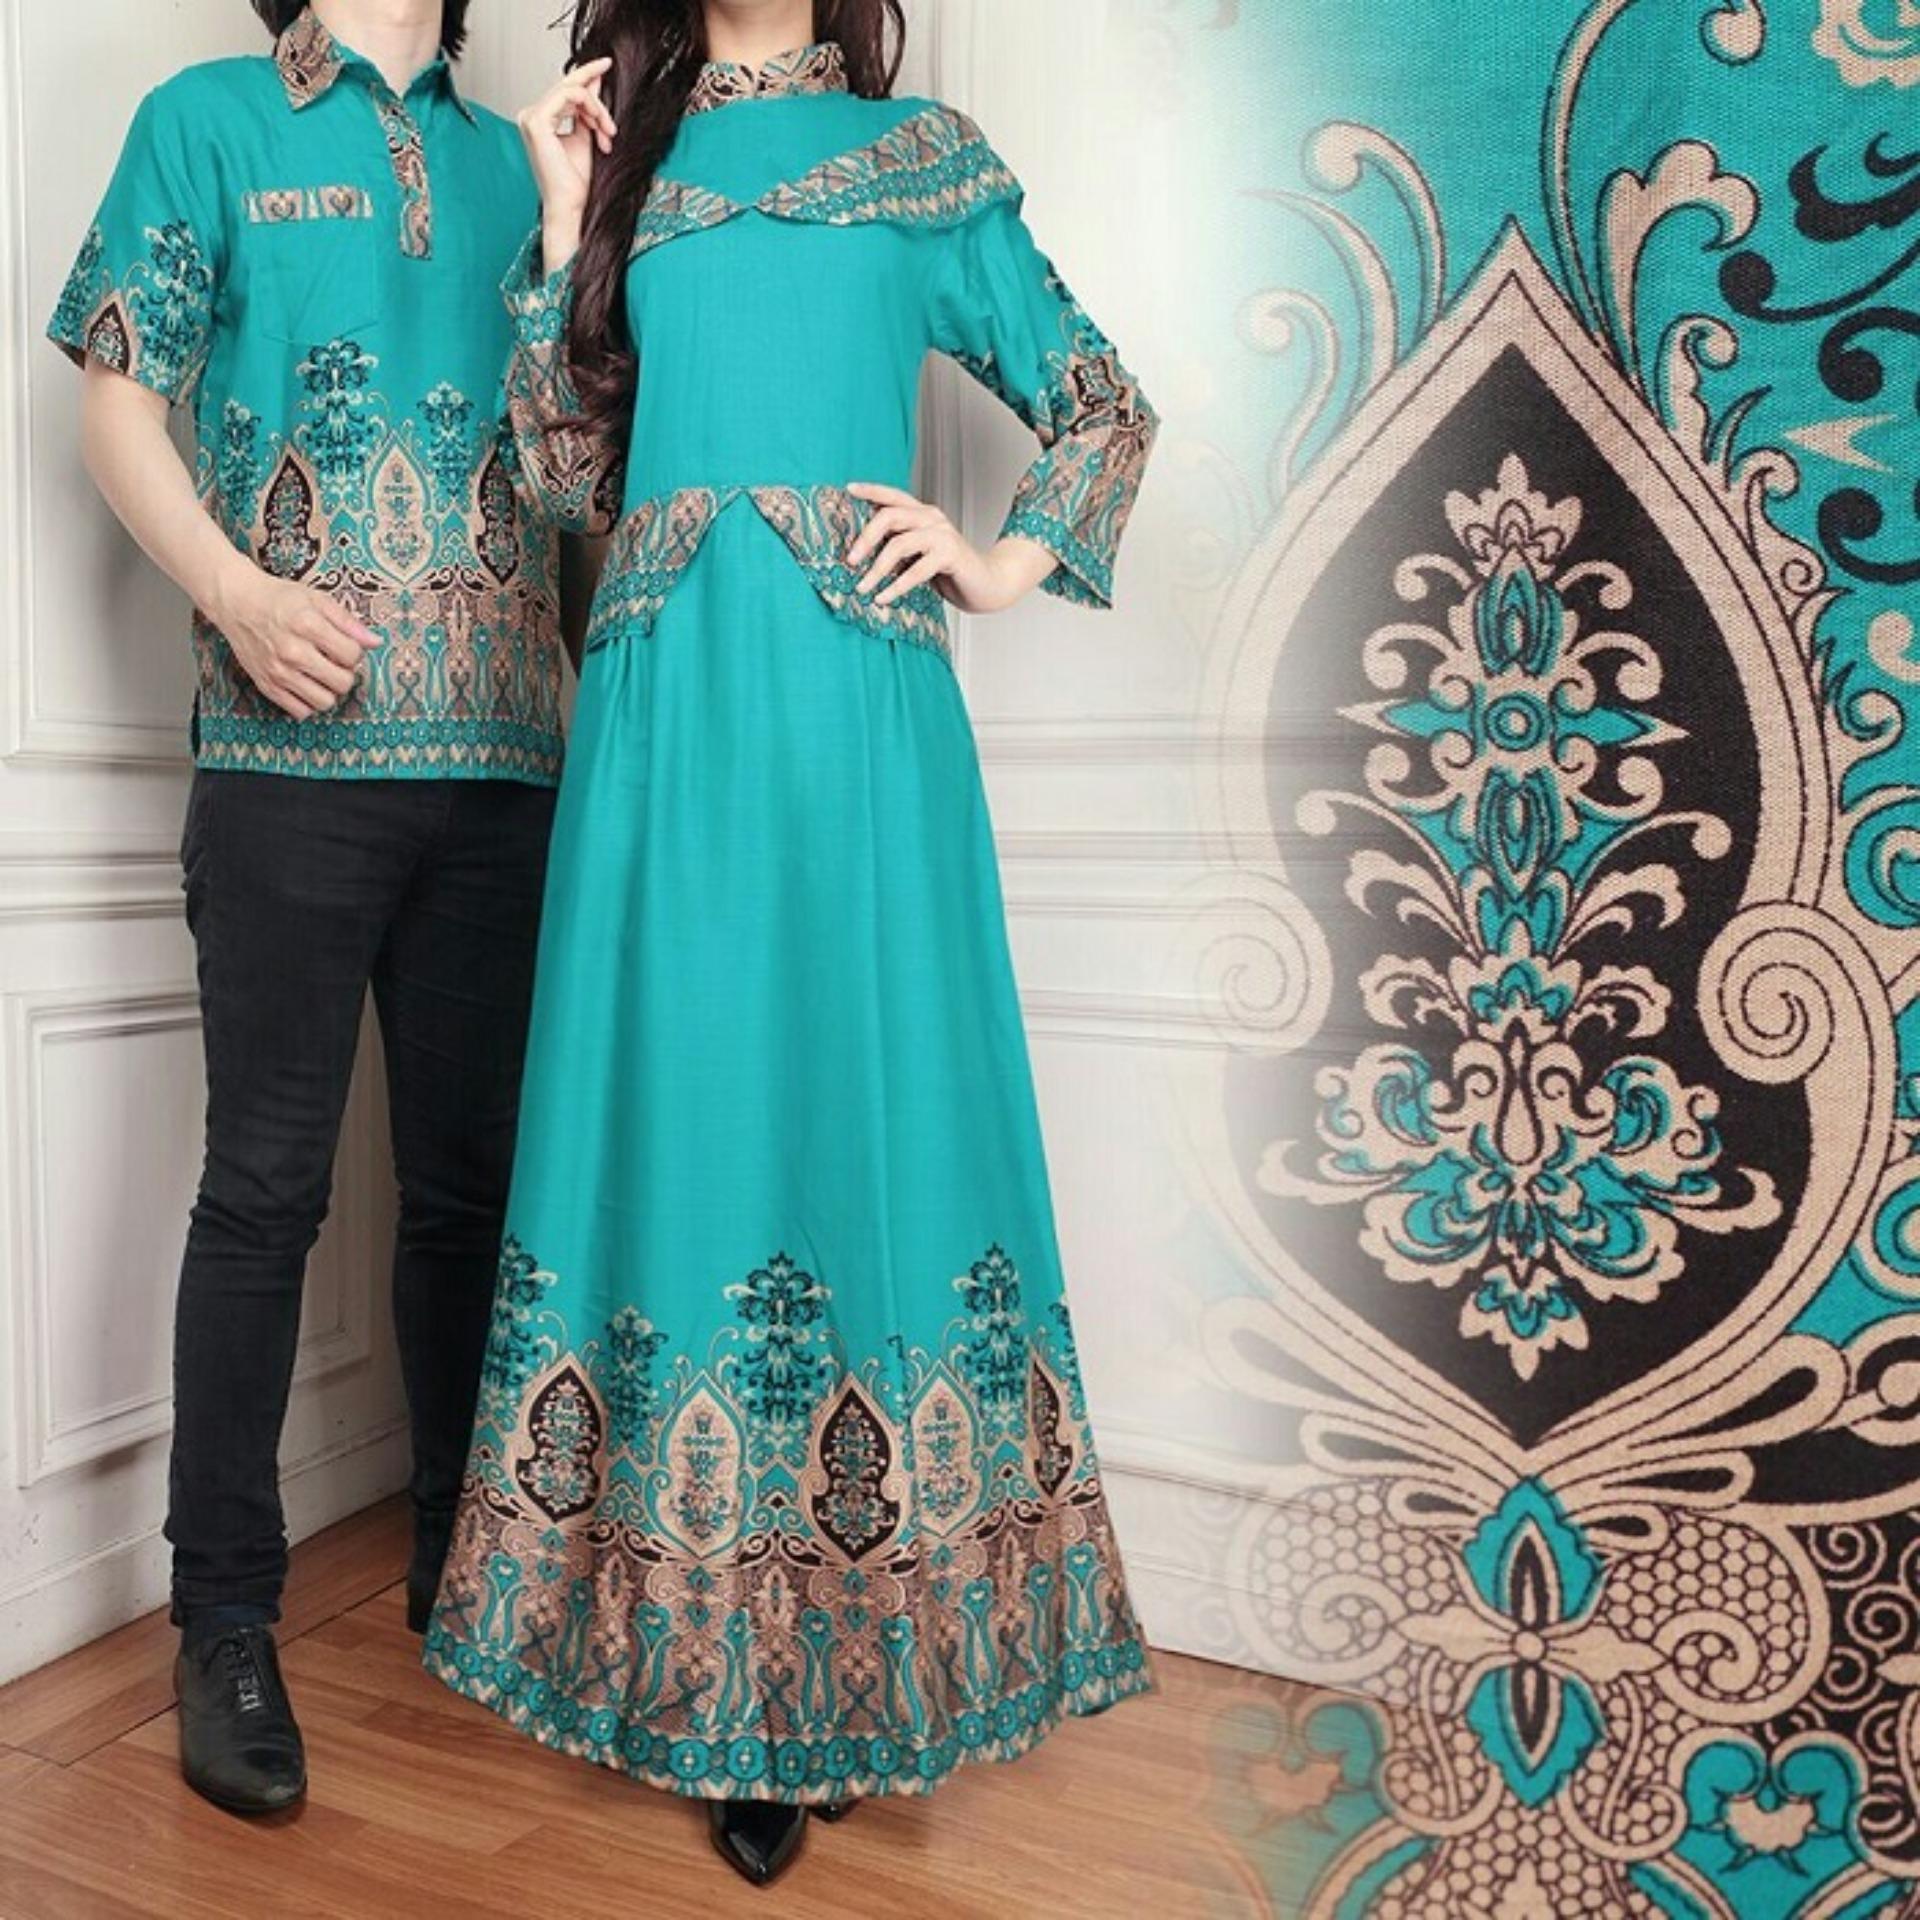 Daftar Harga Baju Couple Pesta Modern Terbaru 2018 Cari Produk Bajuready 10111 Pasangan Keluarga Batik Sarimbit Kemeja Hem Pria Cowok Koko Lengan Pendek